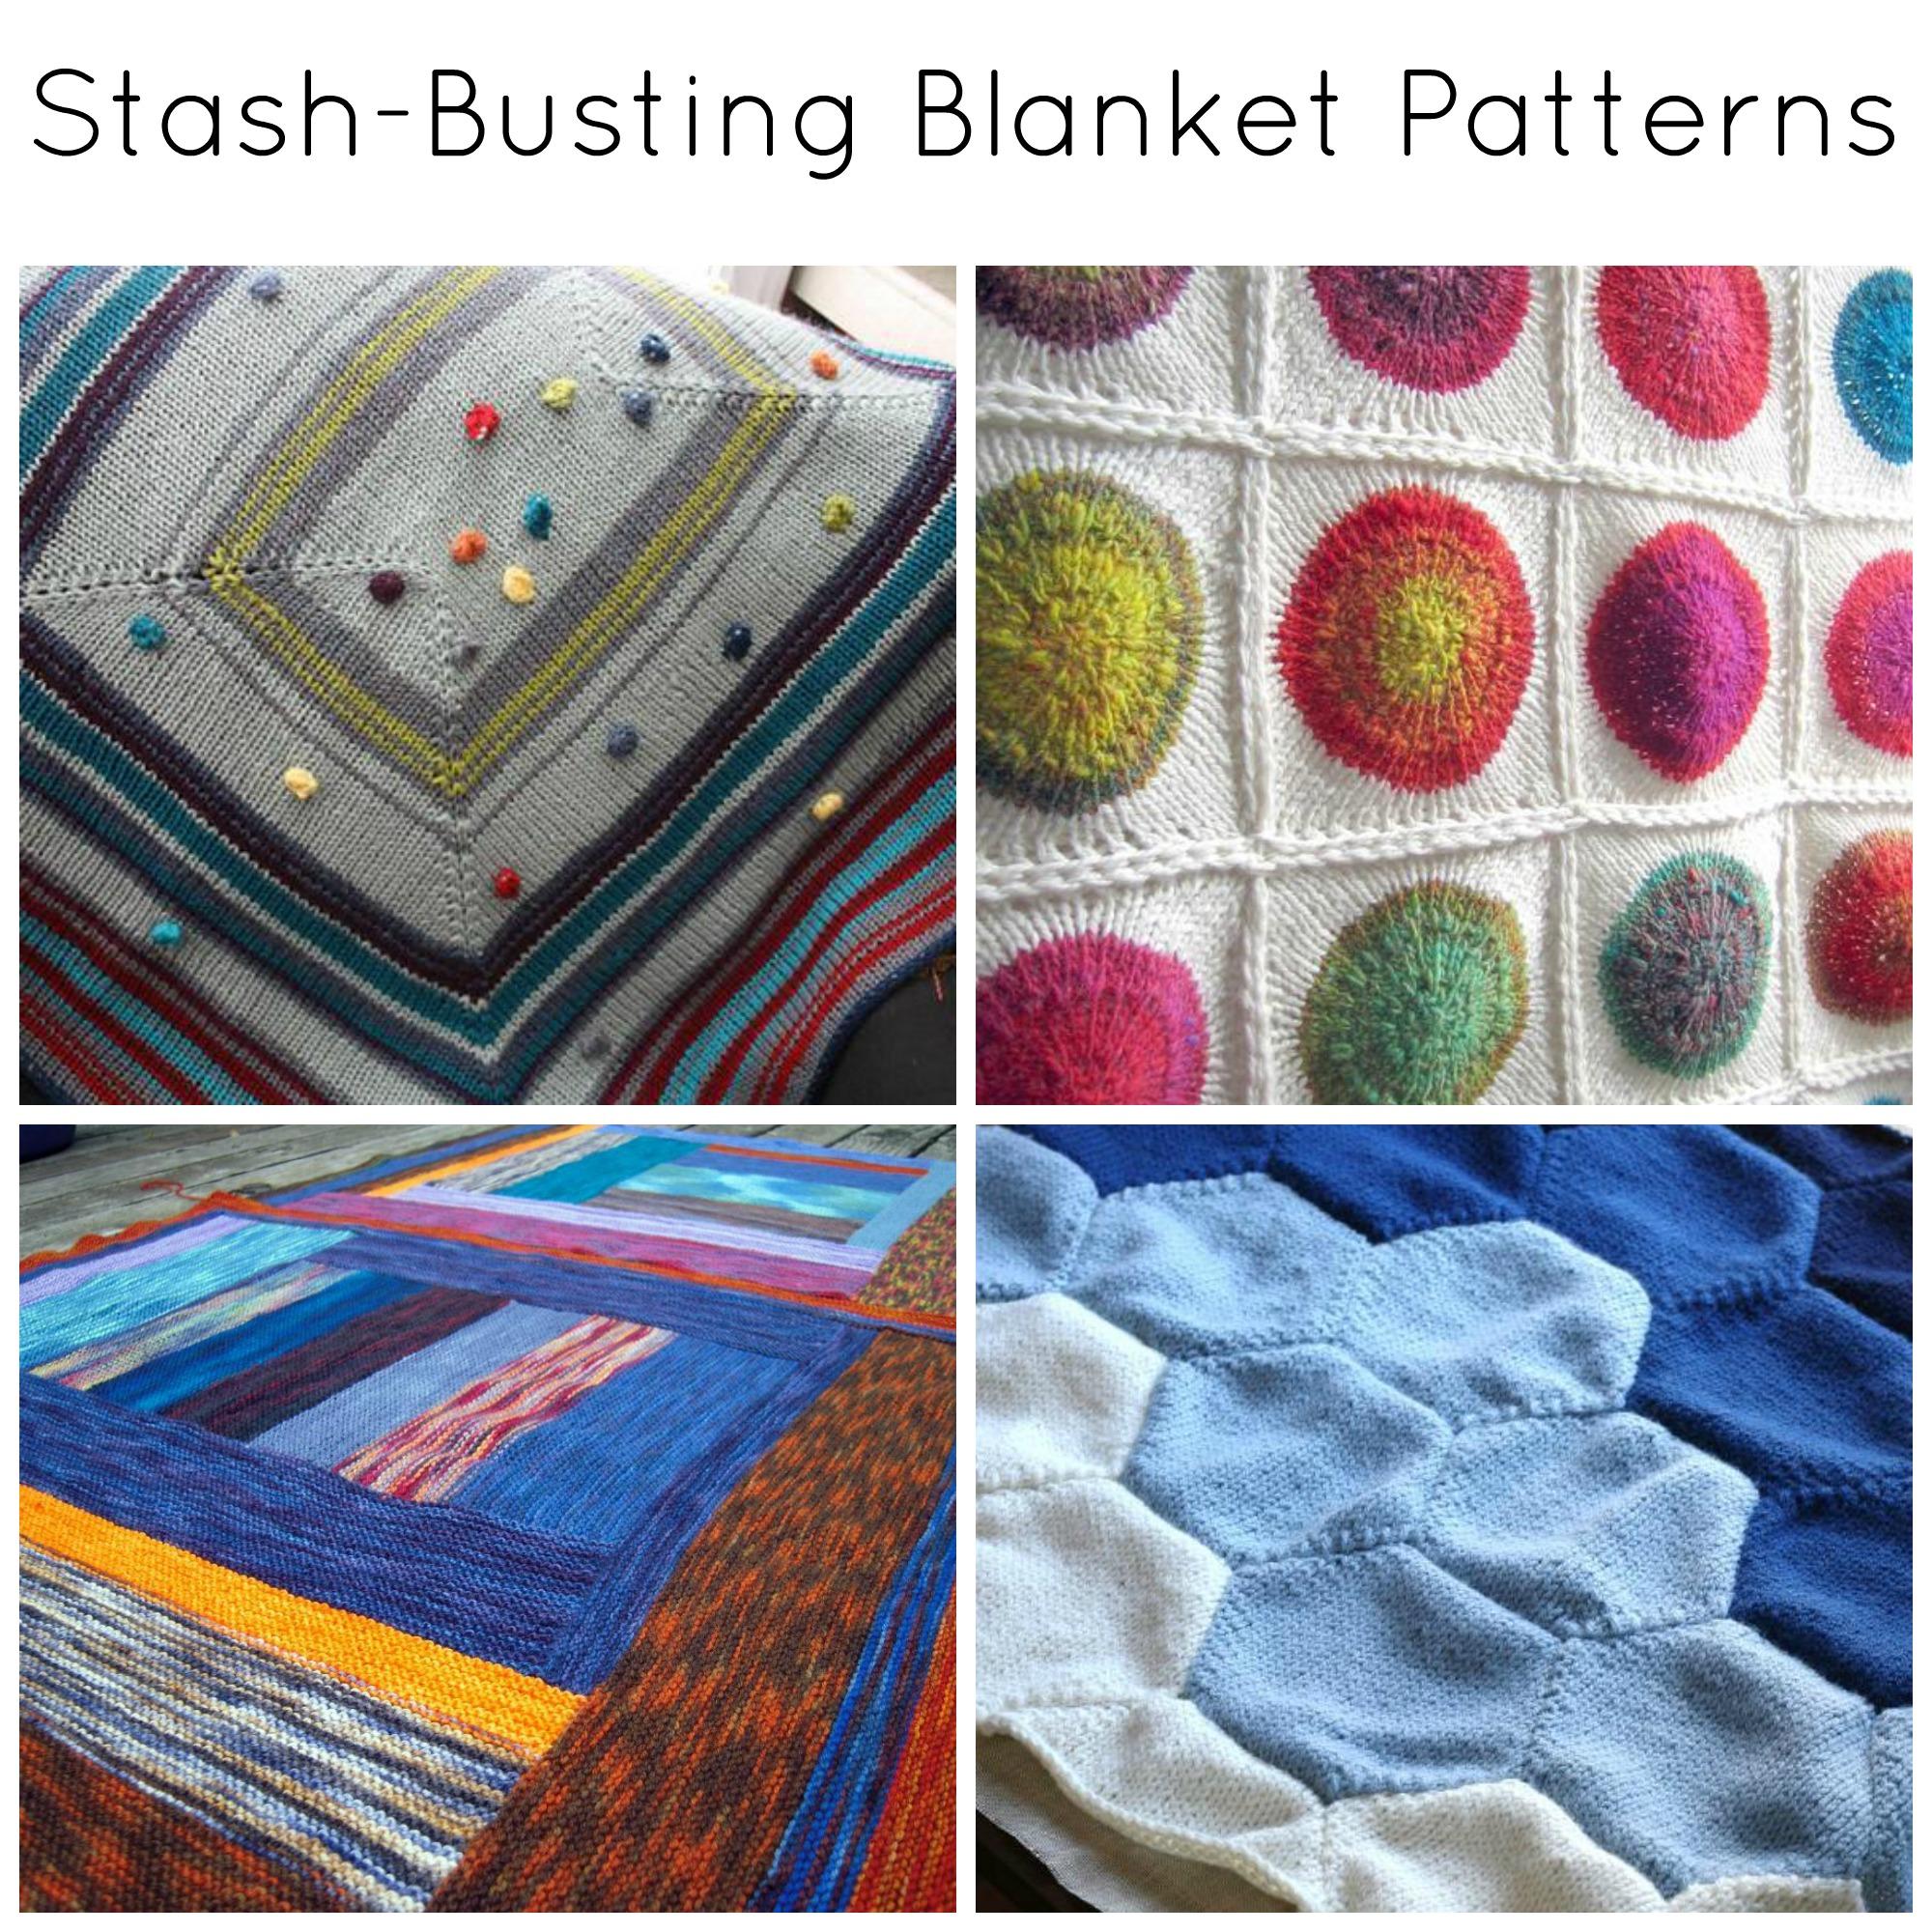 Stash-Busting Blanket Knitting Patterns